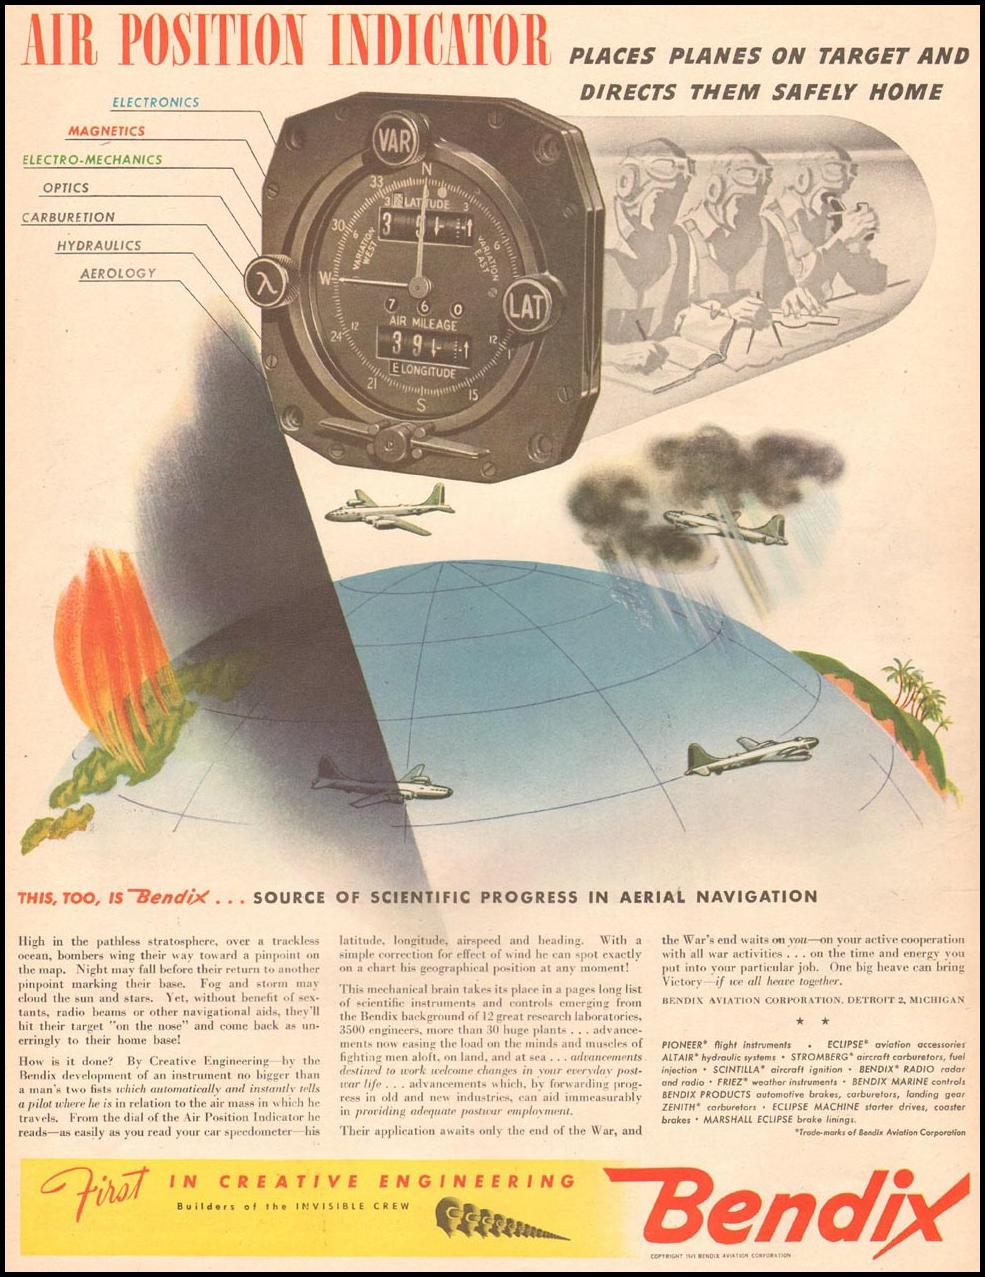 BENDIX AIR POSITION INDICATOR LIFE 06/04/1945